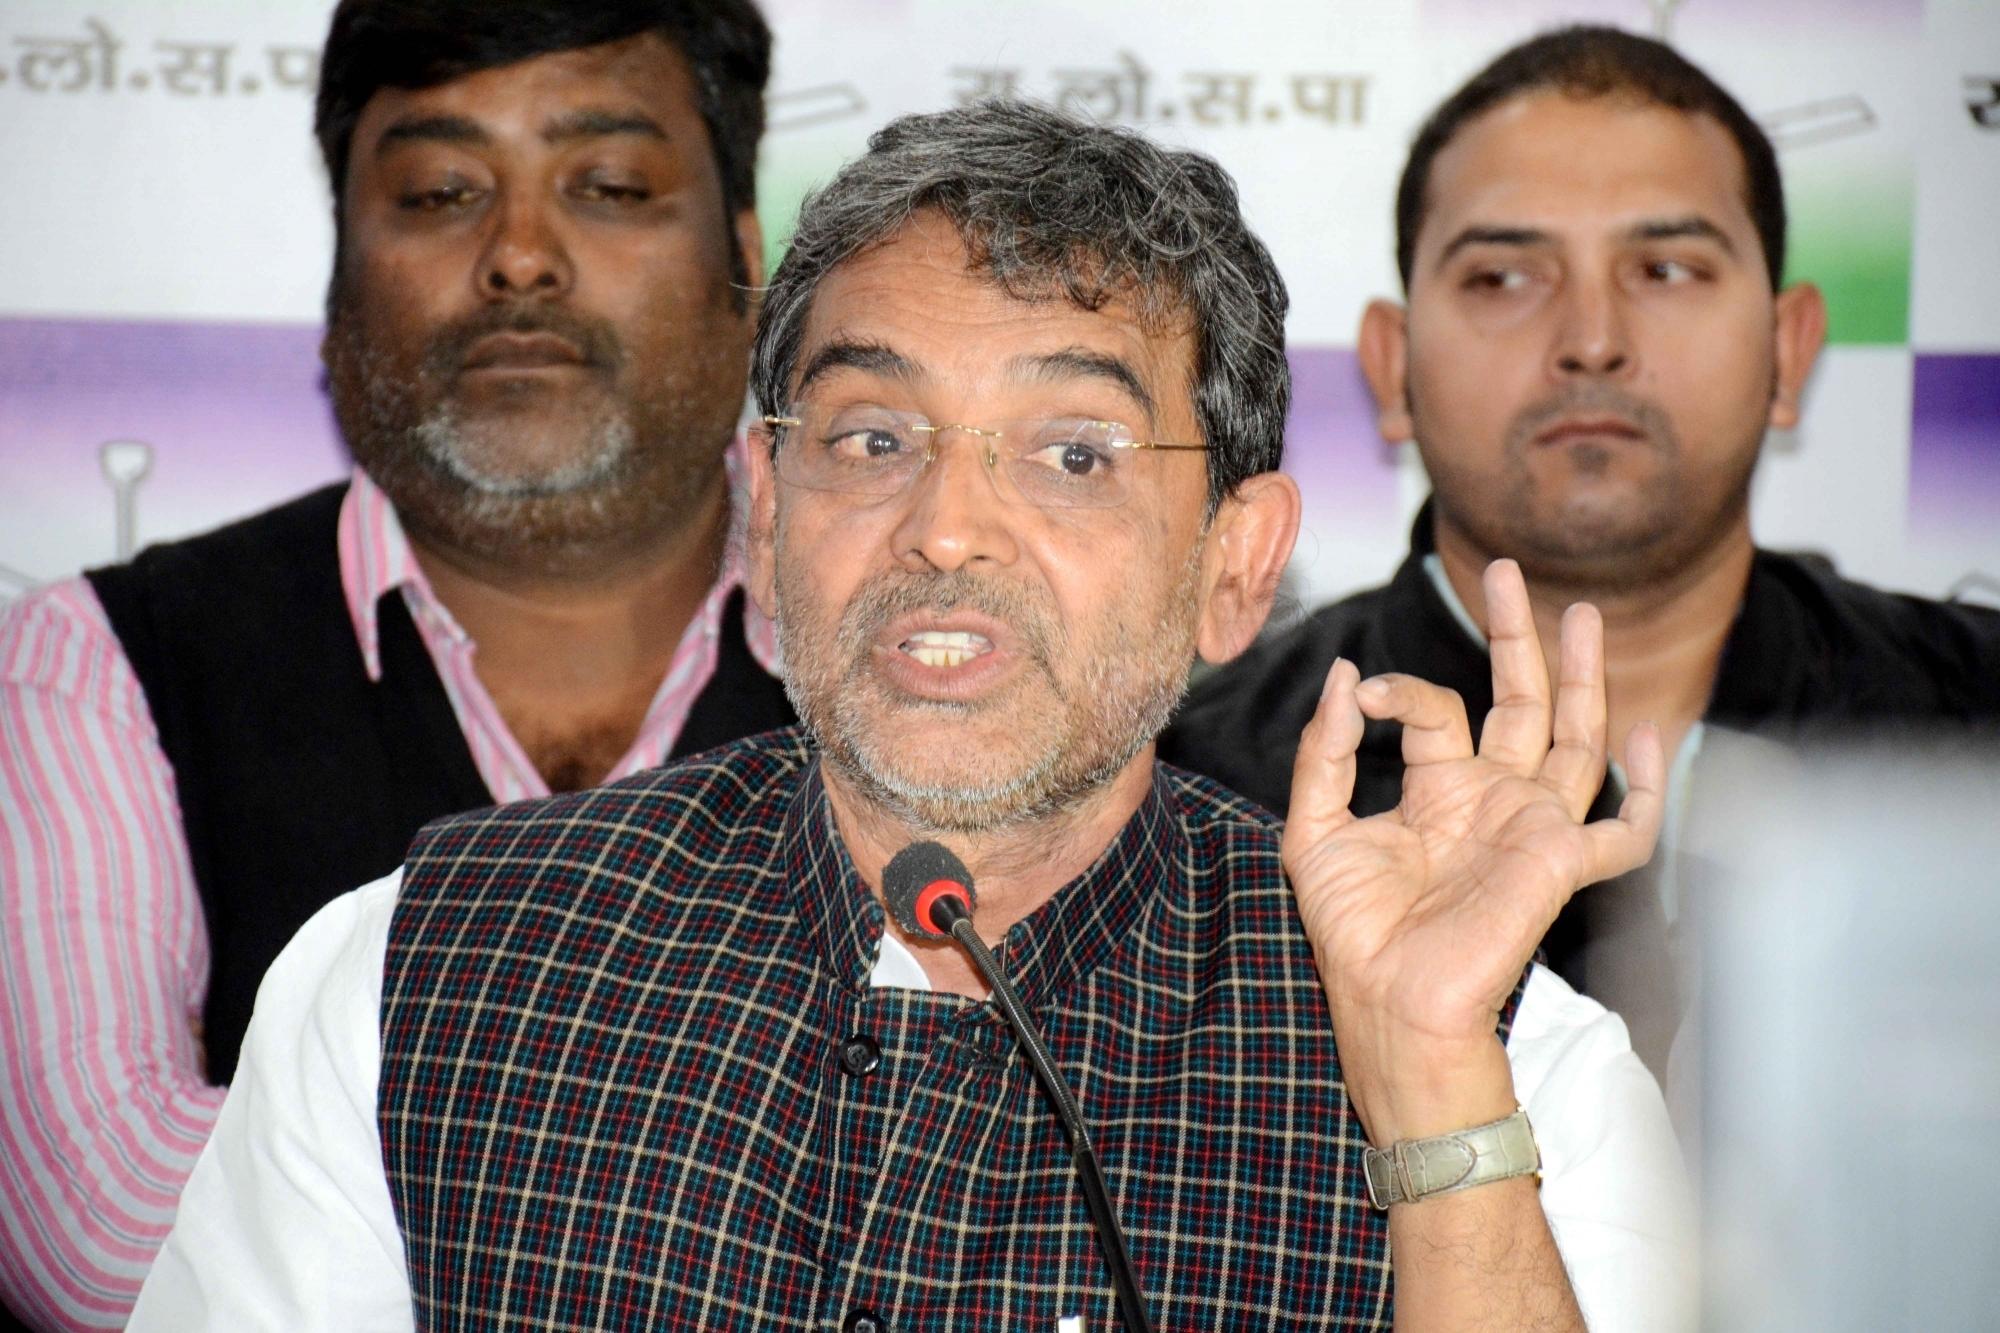 Kushwaha opposes BJP's Ram temple agenda